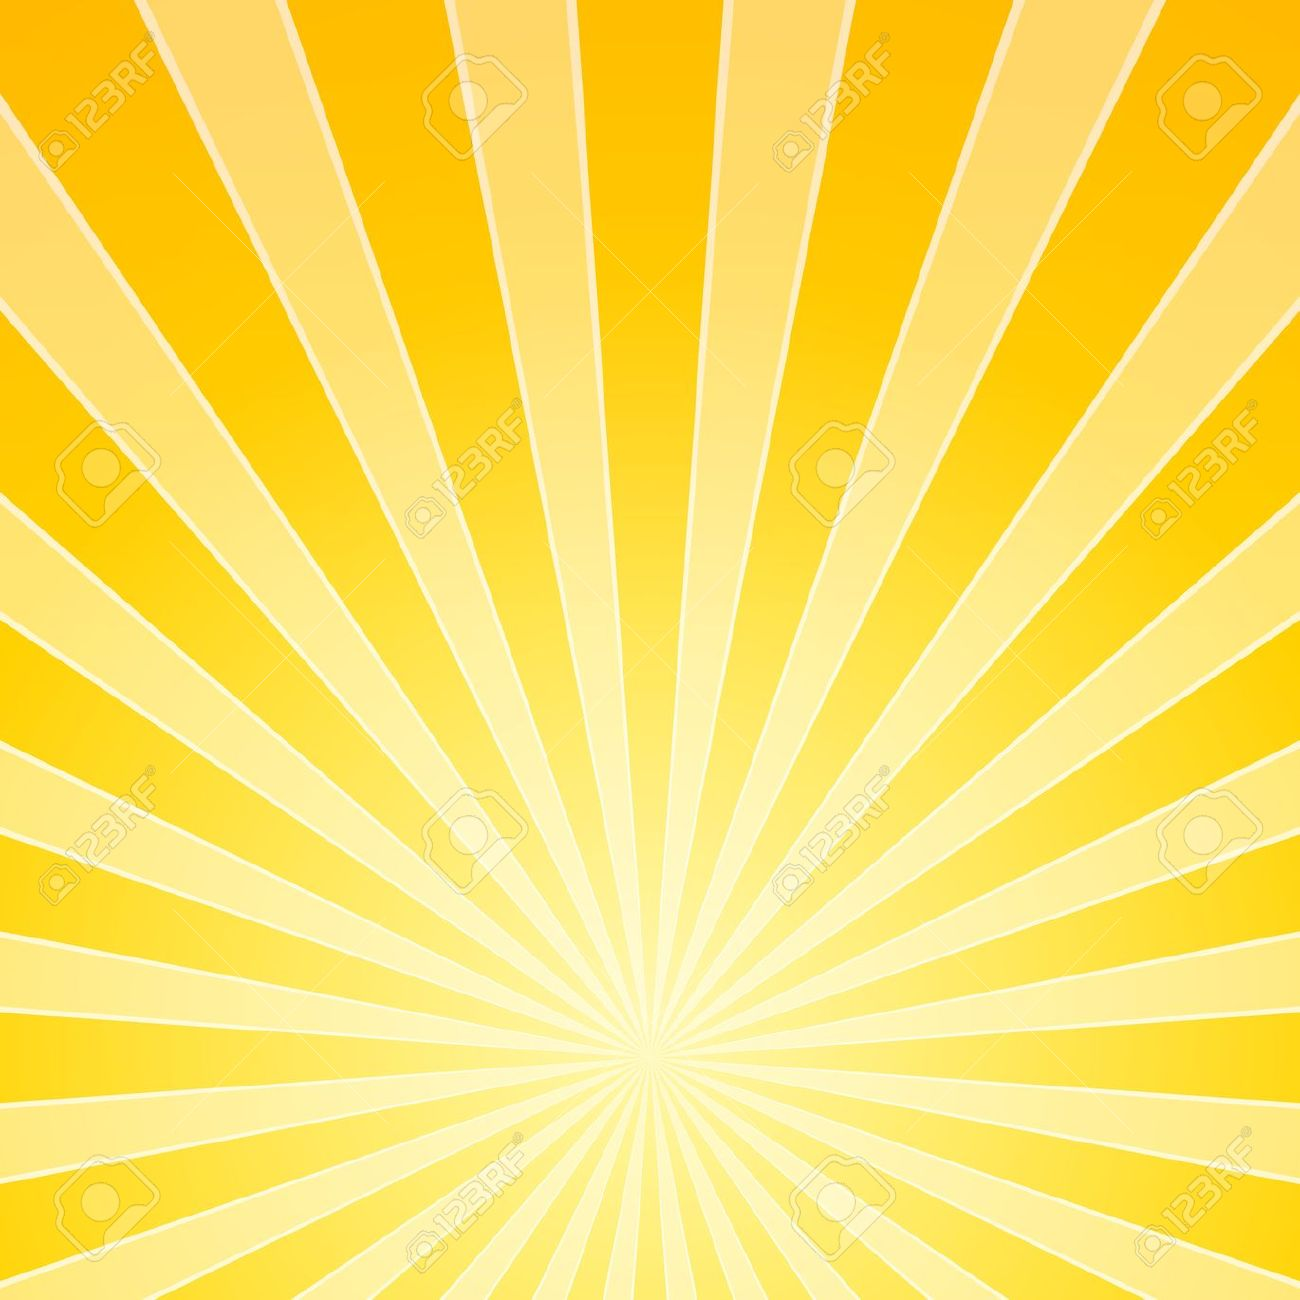 yellow rays vector - photo #12